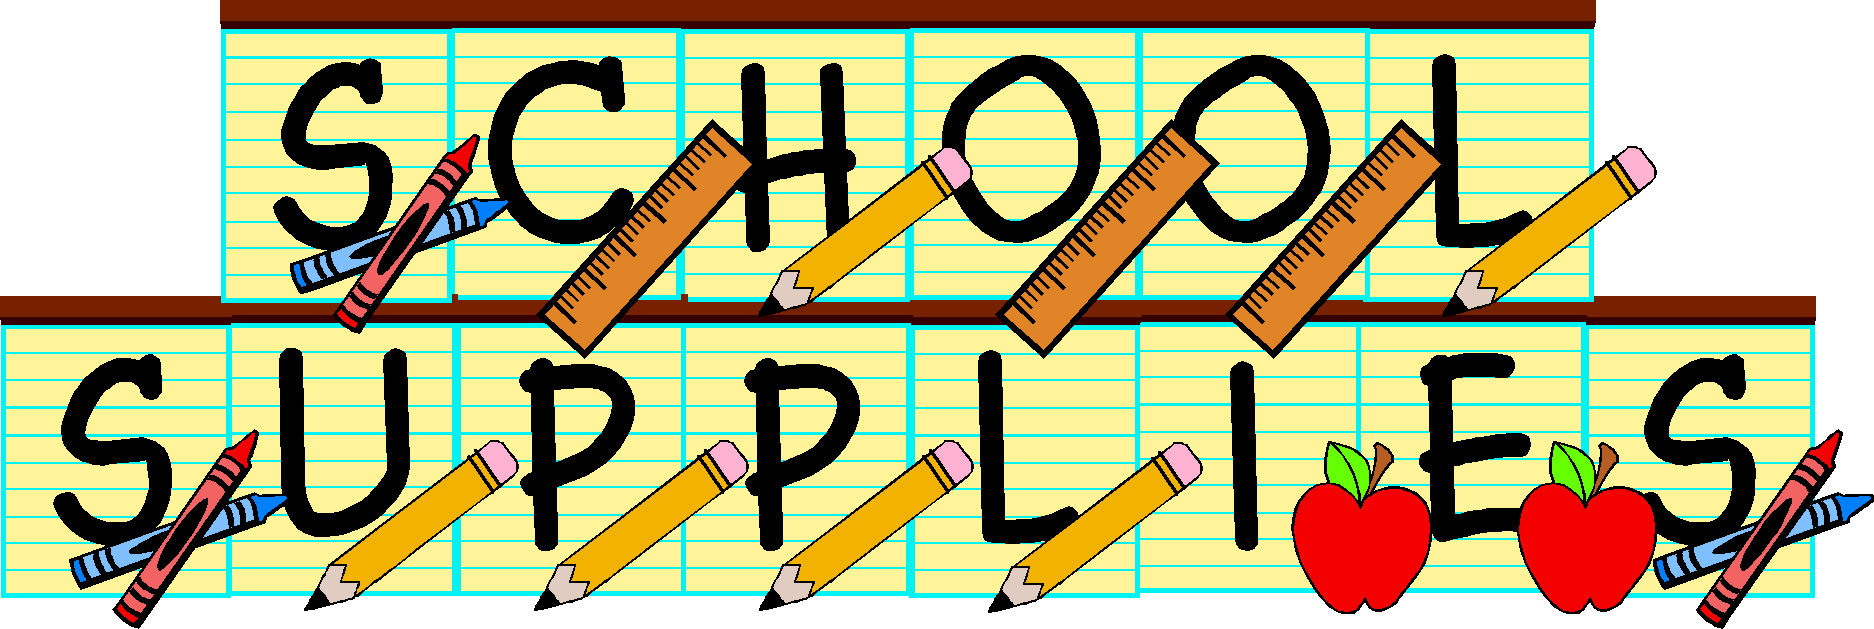 School supplies drive clipart